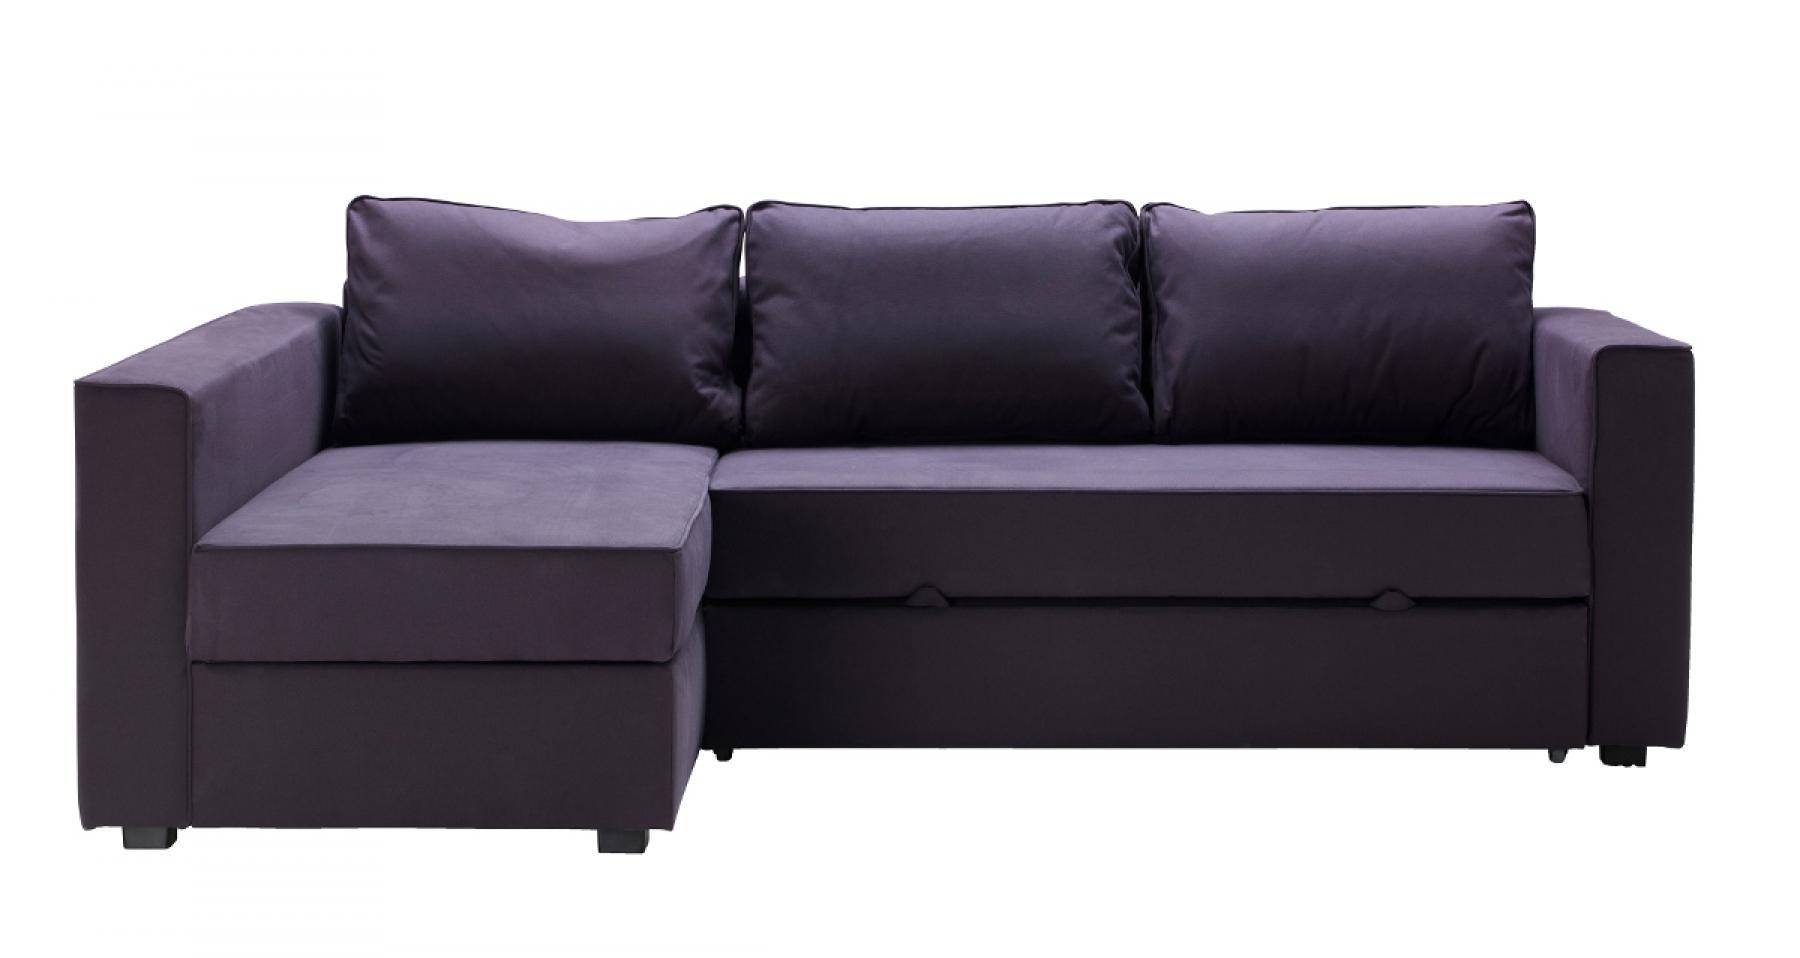 photos canap d 39 angle convertible ikea. Black Bedroom Furniture Sets. Home Design Ideas